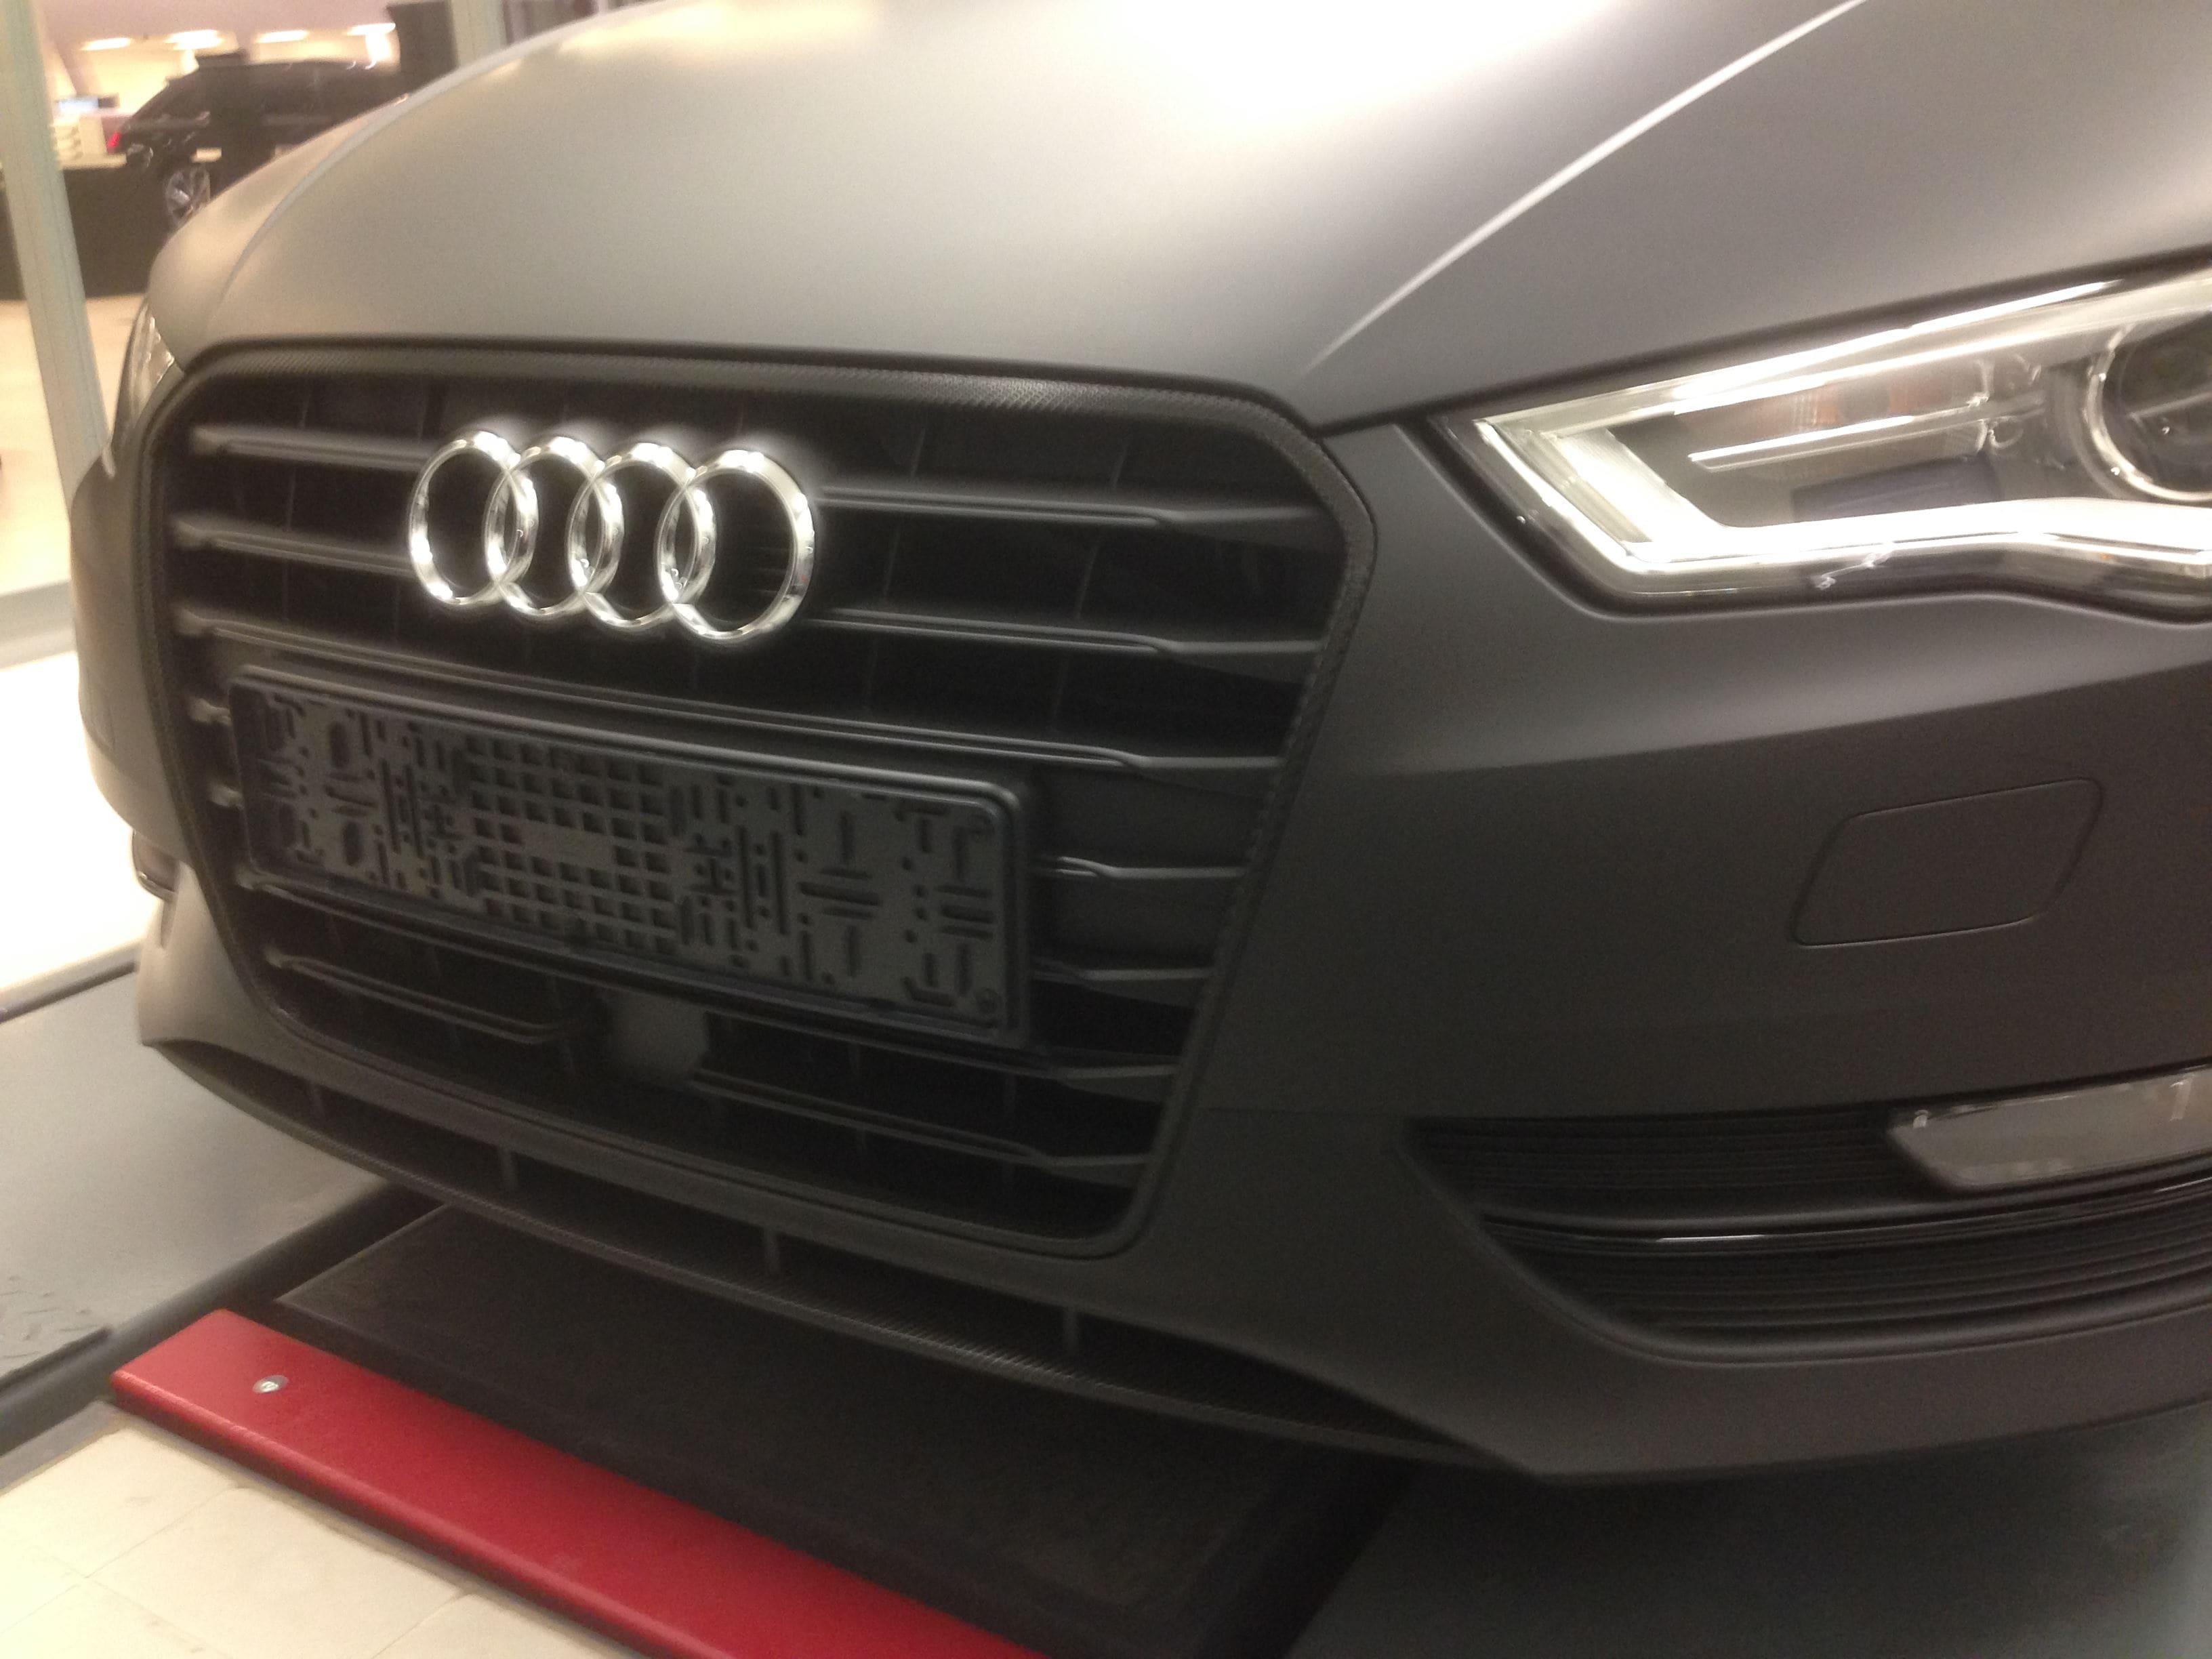 Audi A3 2014 met Mat Zwarte Wrap, Carwrapping door Wrapmyride.nu Foto-nr:4463, ©2021